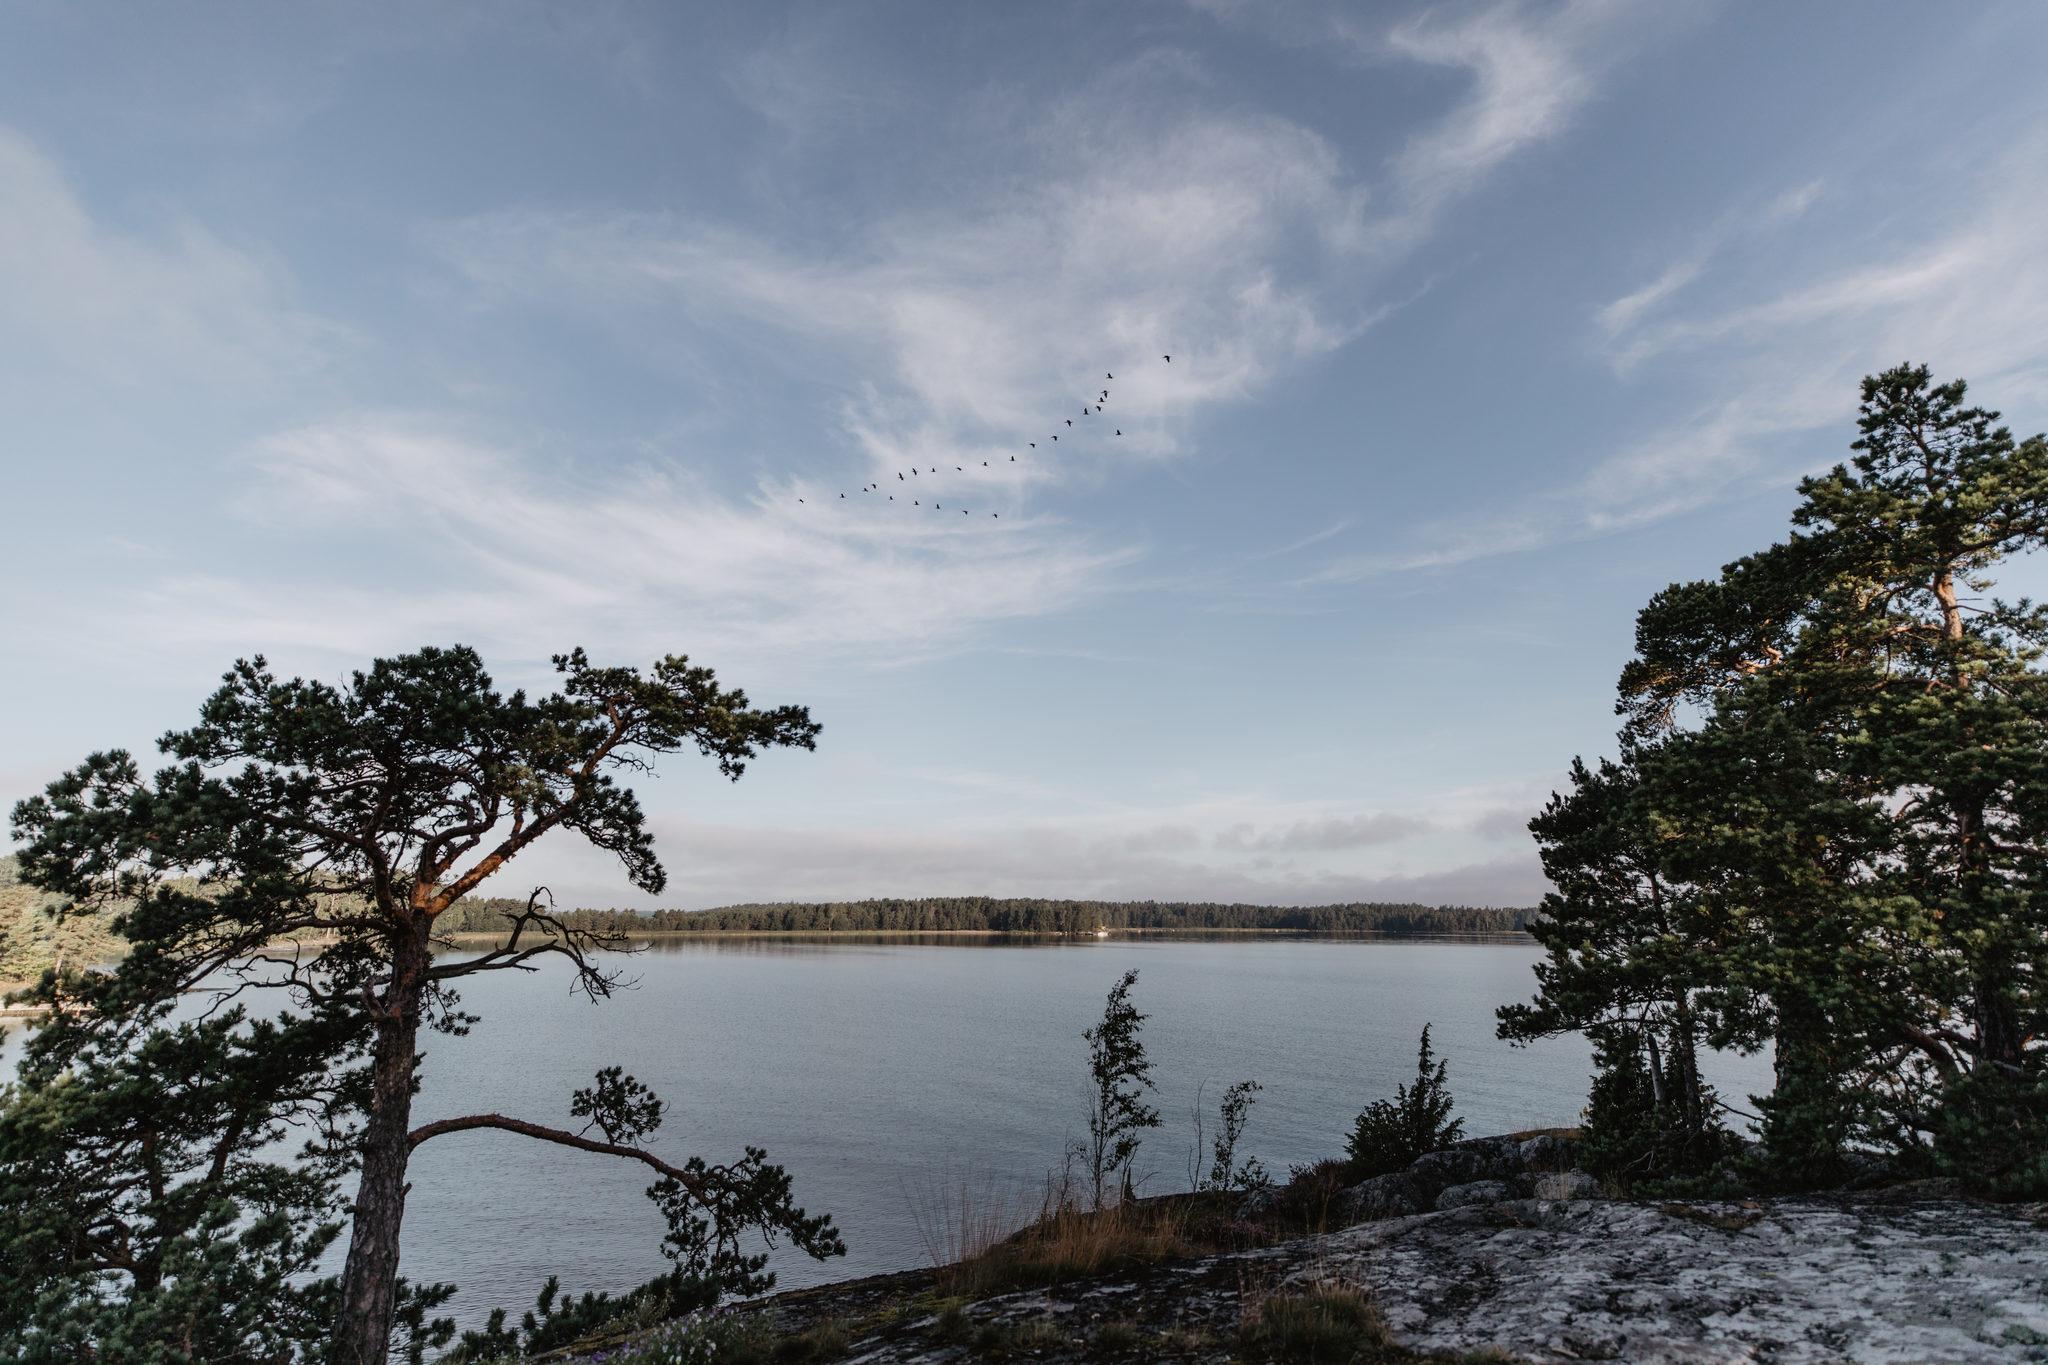 The Eastern Helsinki archipelago